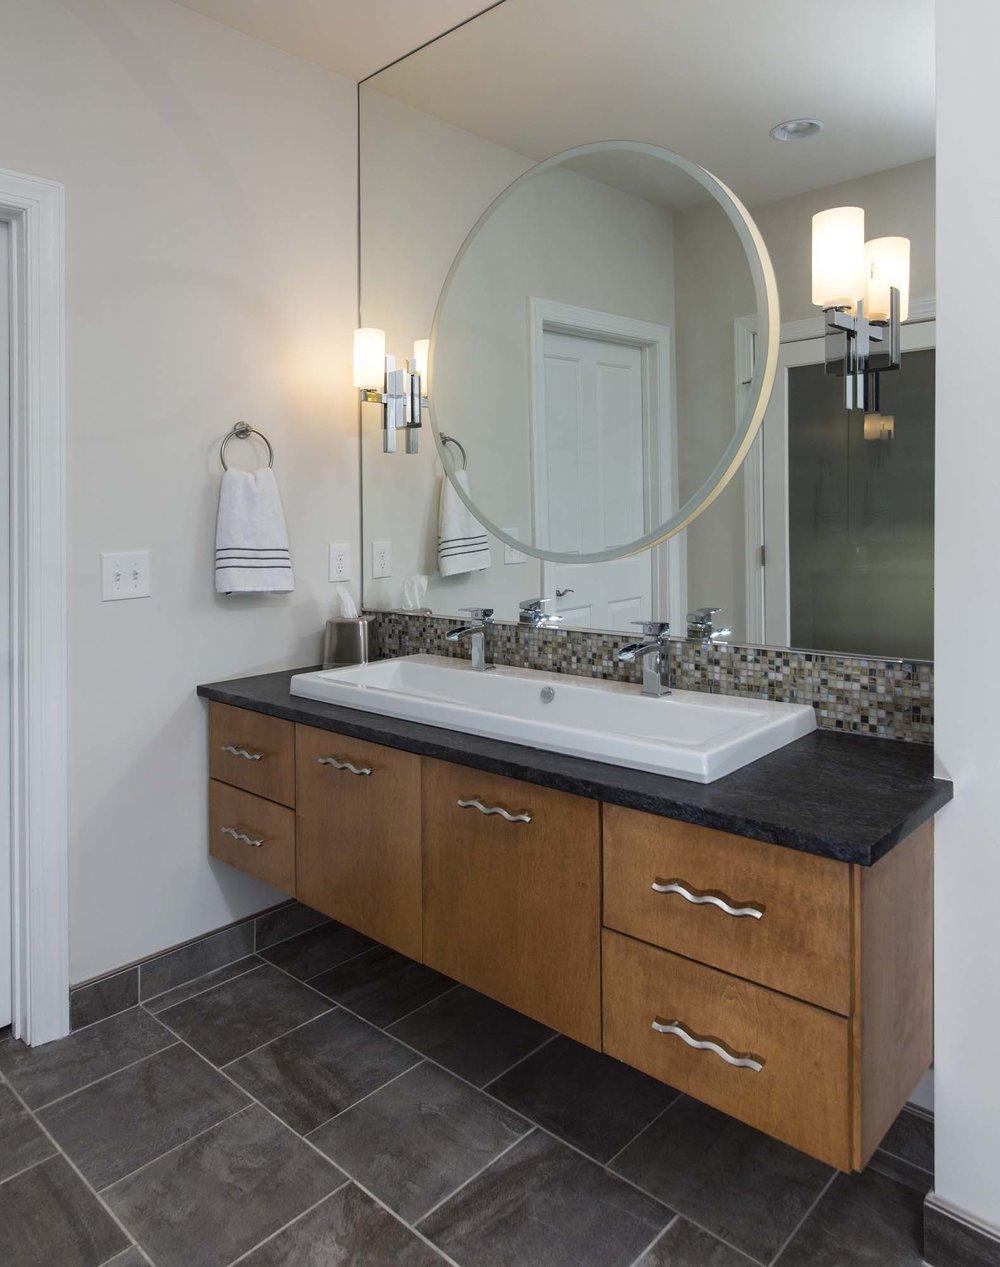 floating-vanity-spa-bath-interior-design.jpg